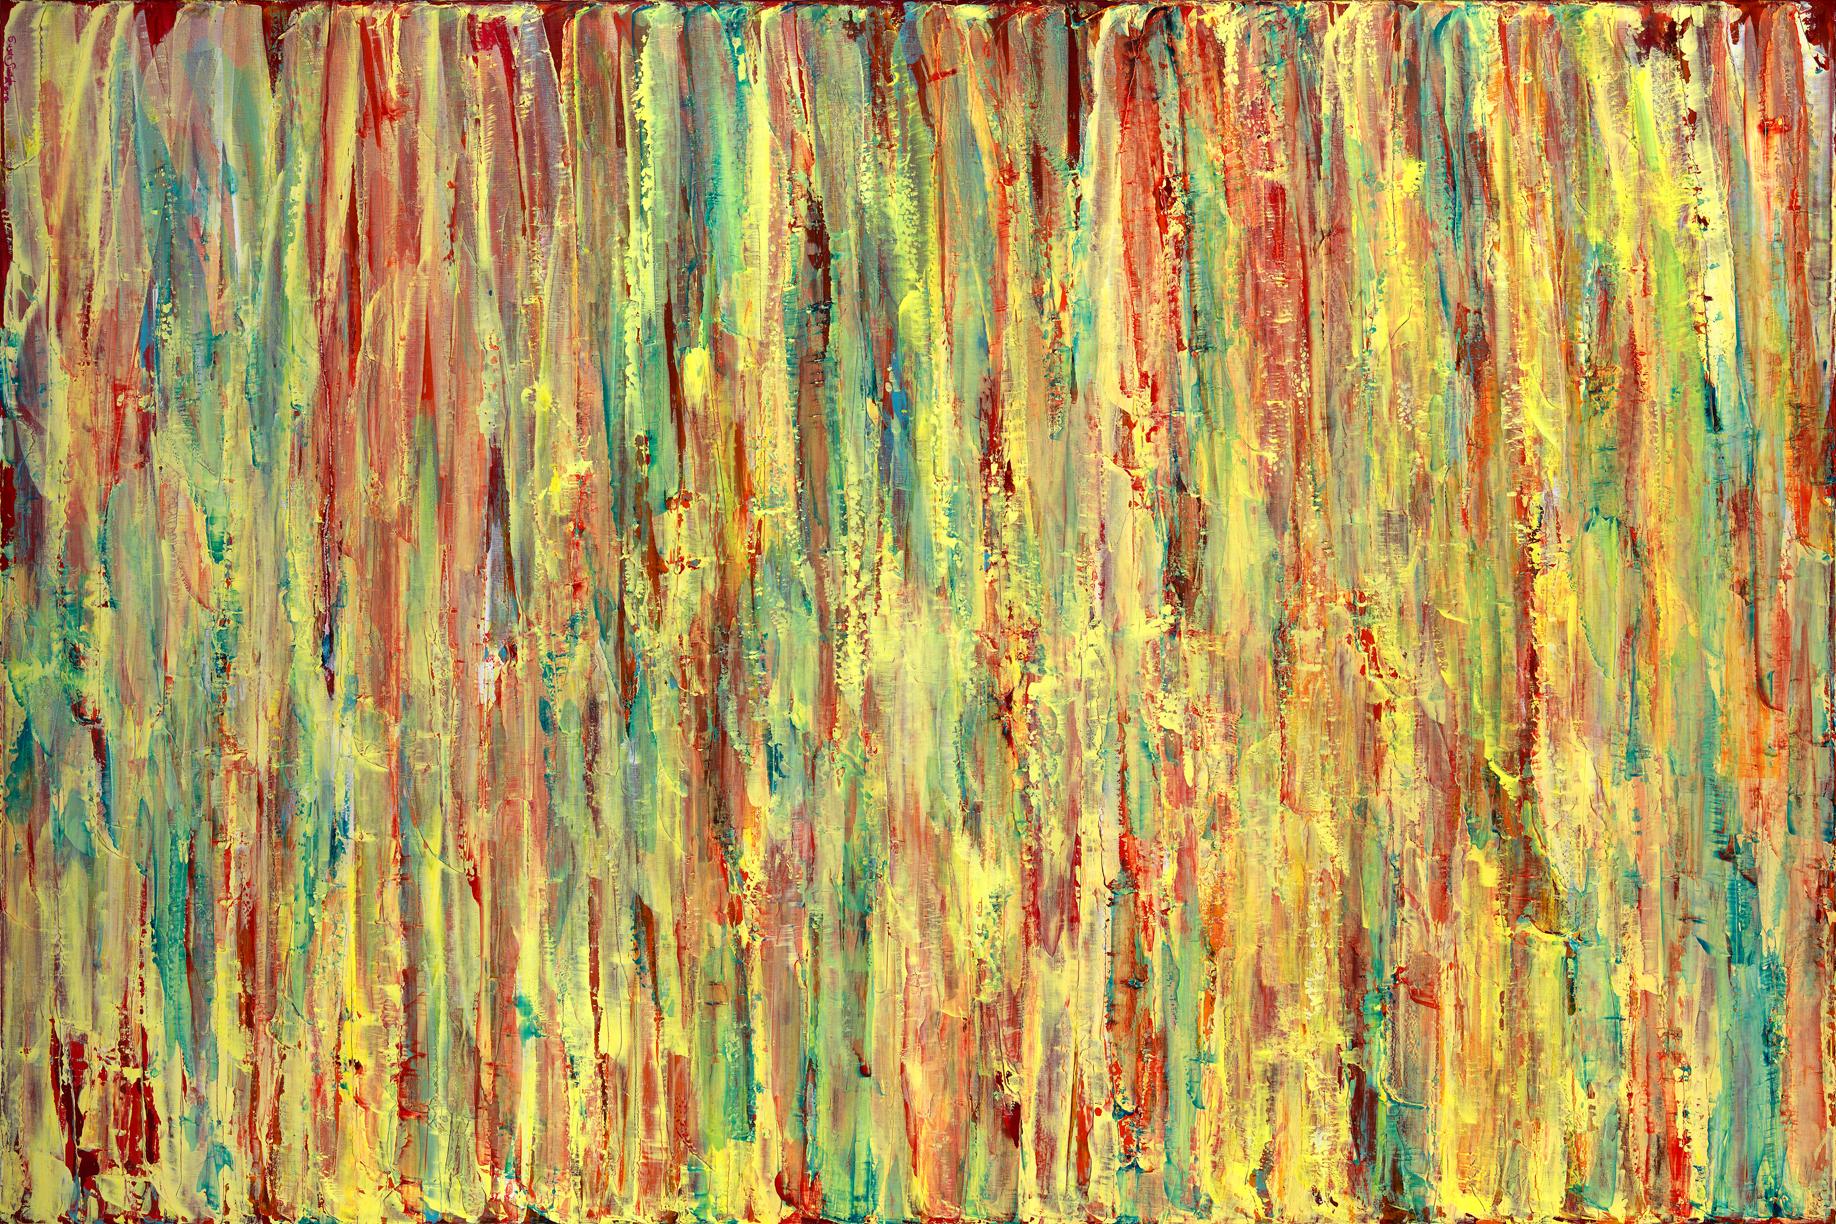 Landscape of Resonances 007 48x72.png